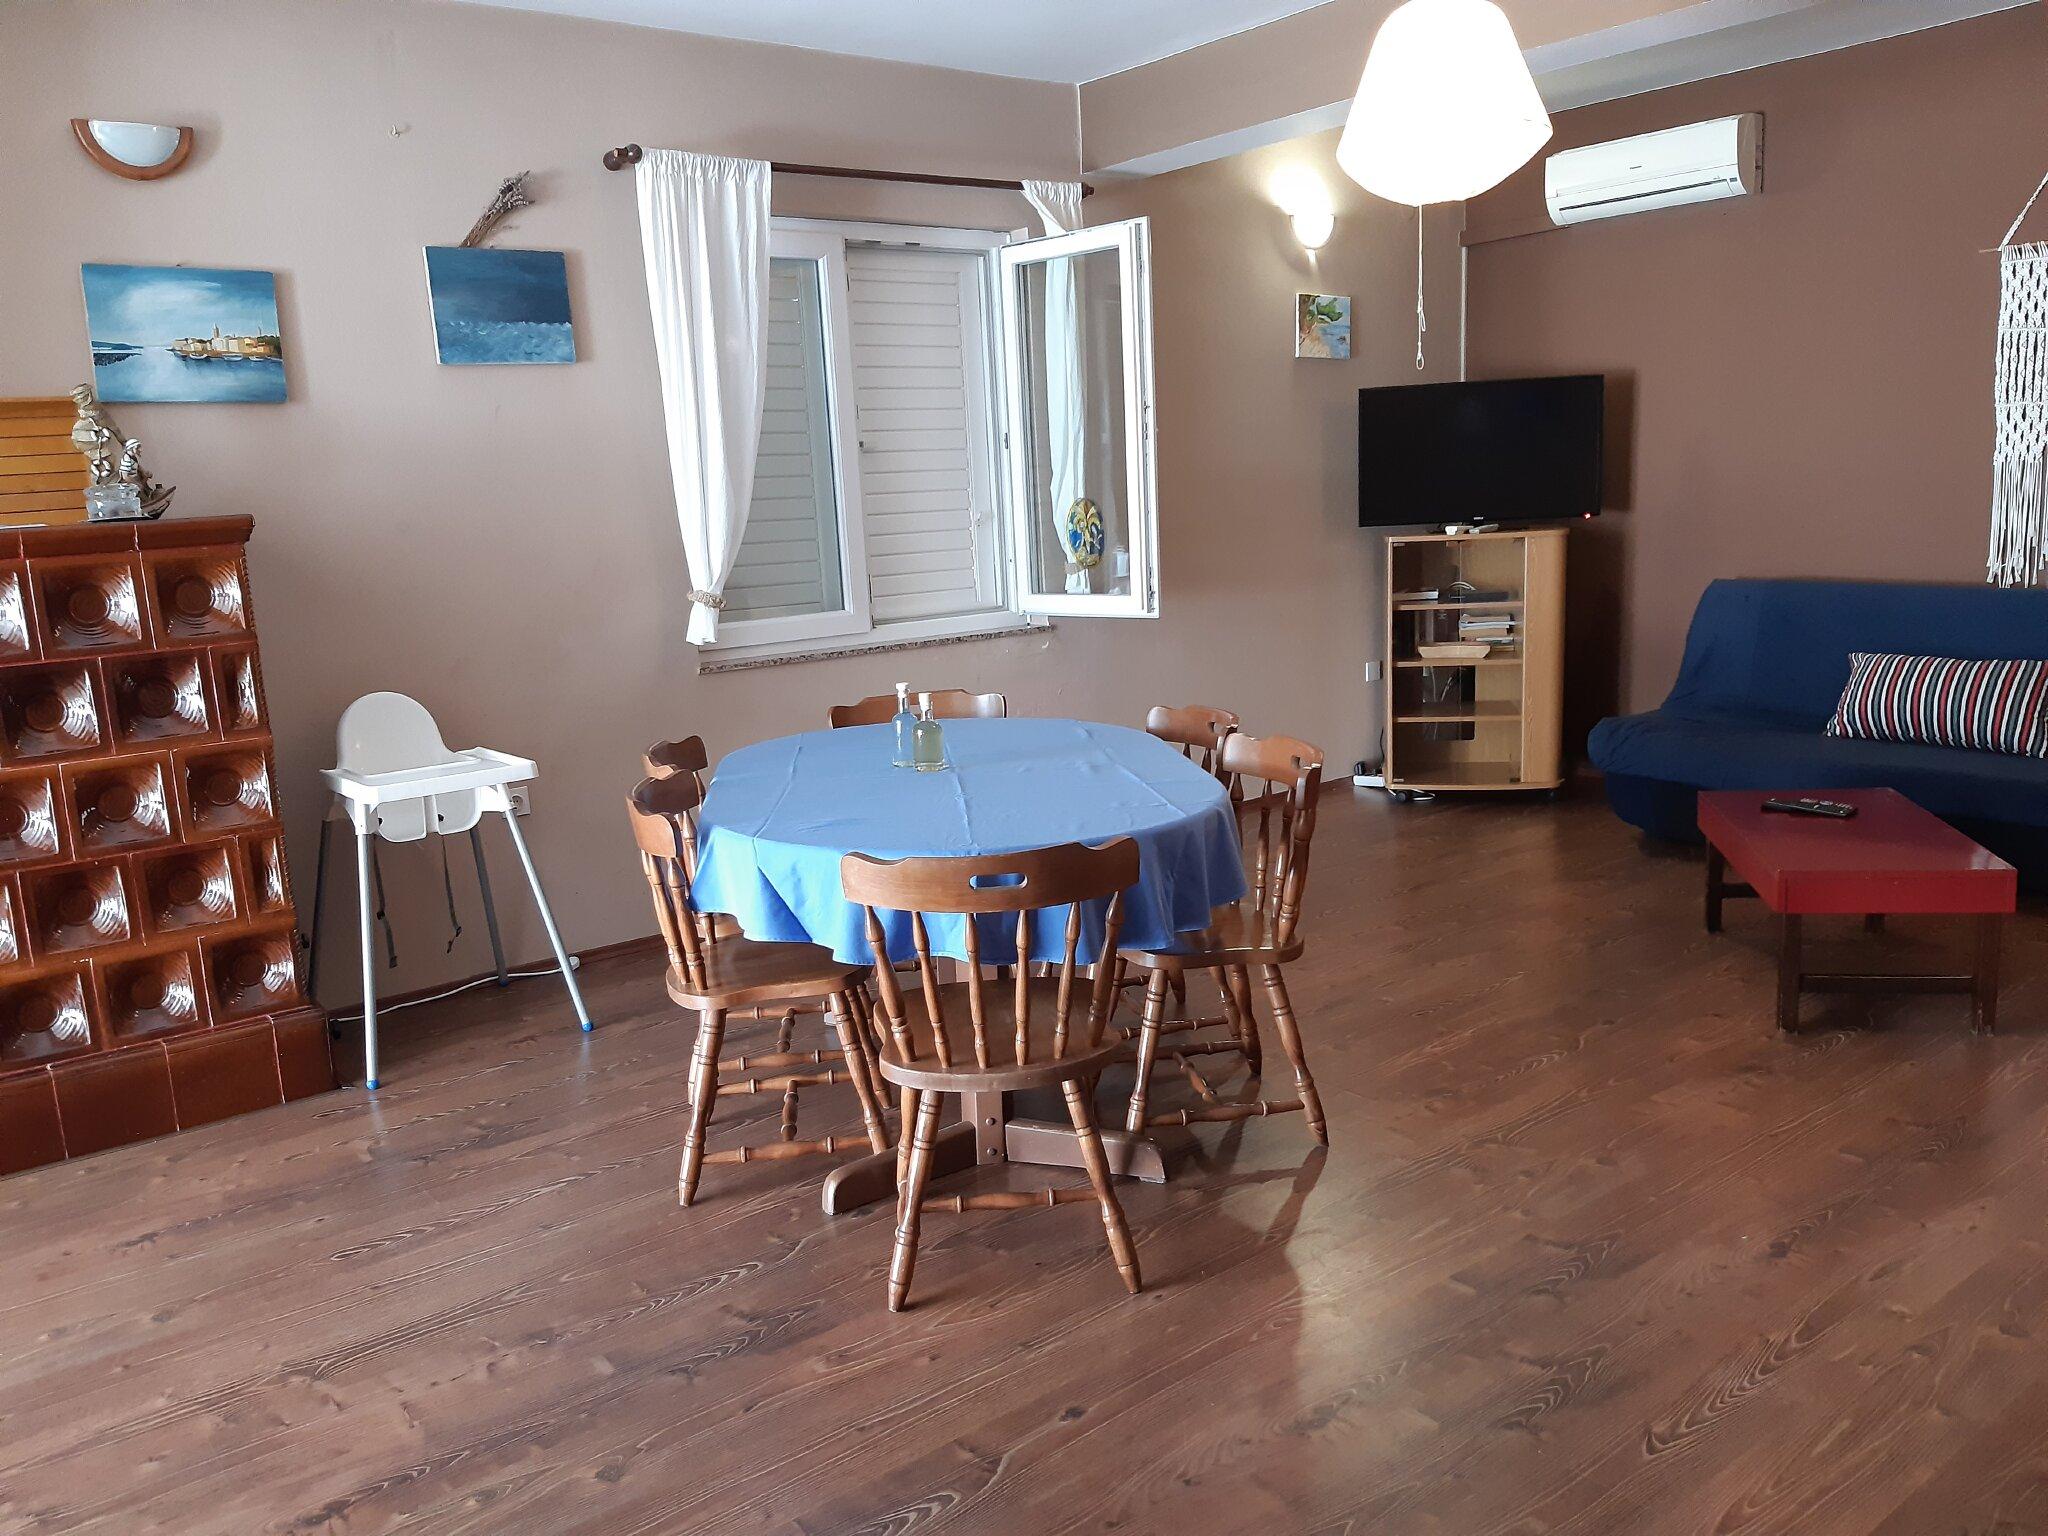 VILLA KATIA: Küche mit Balkon Meerblick